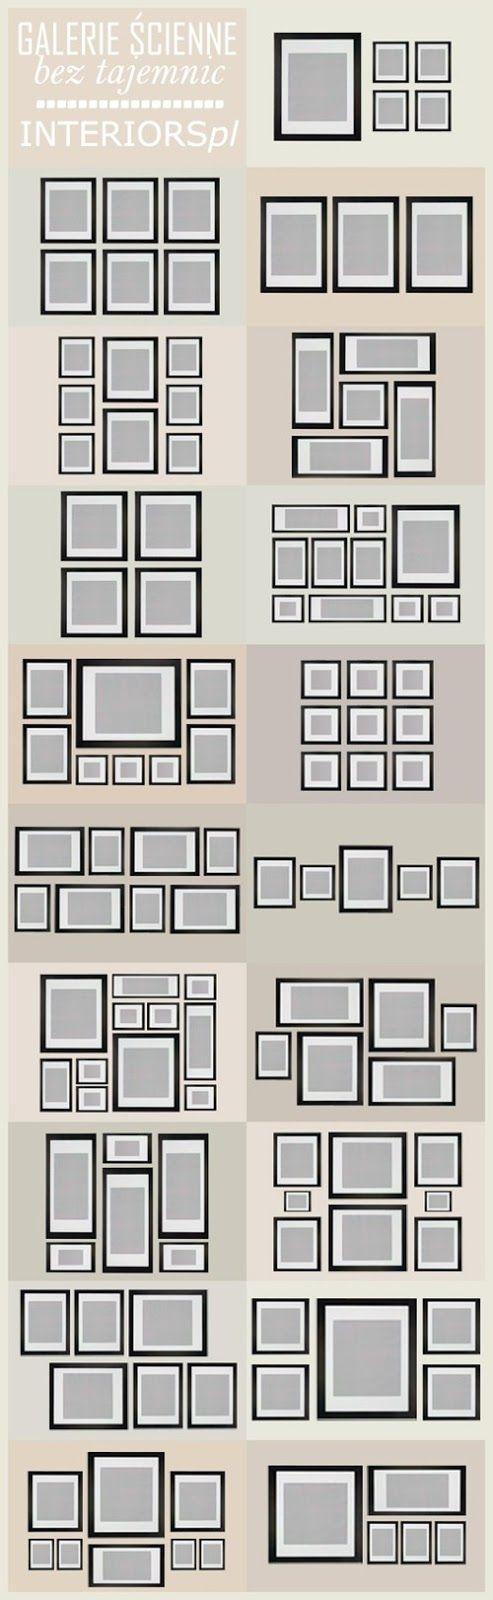 Como organizar quadros nas paredes - How to arrange pictures on the walls